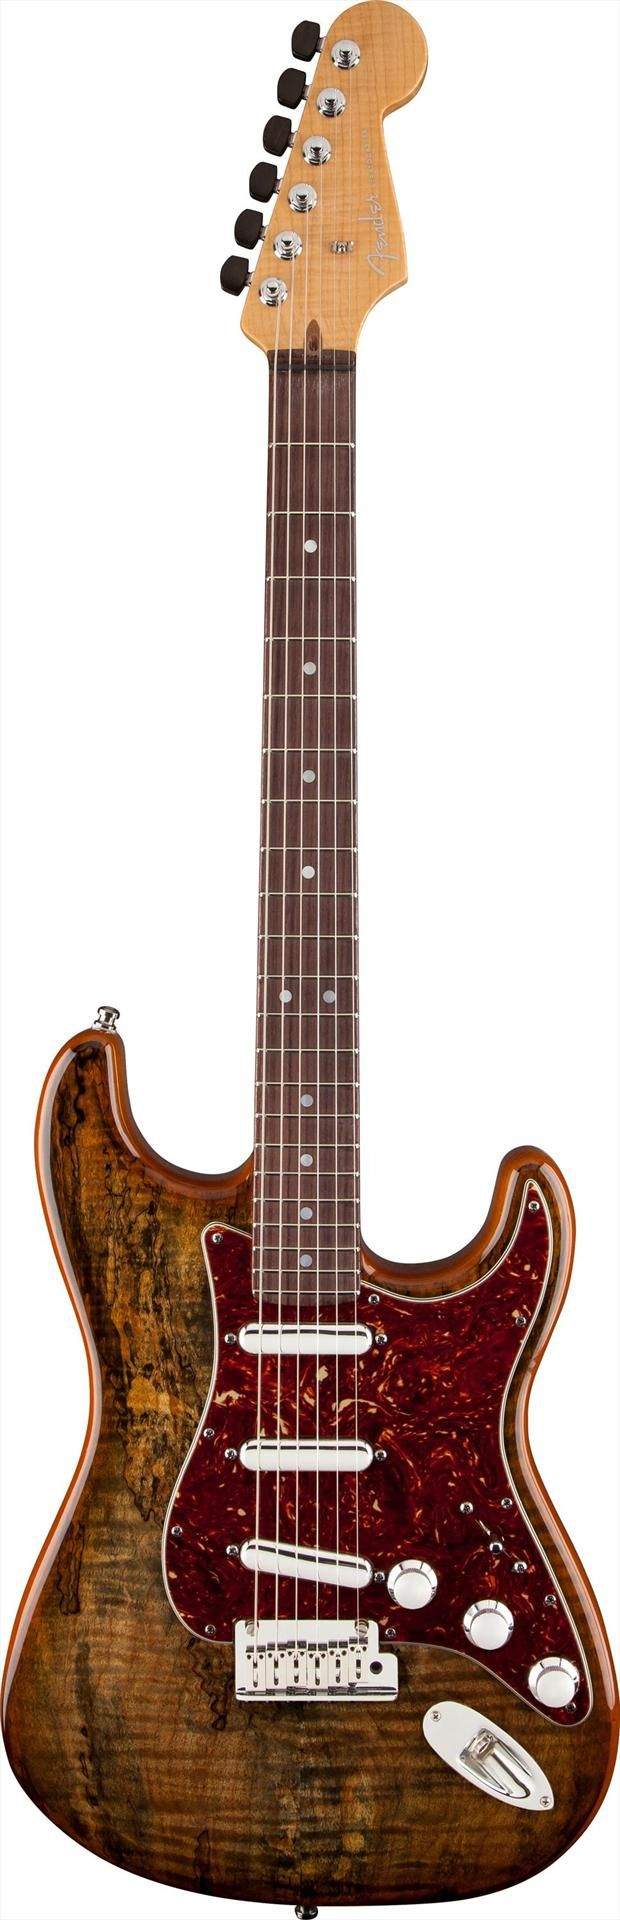 Fender Custom Shop Spalted Maple Top Artisan Buckeye Stratocaster | Andertons